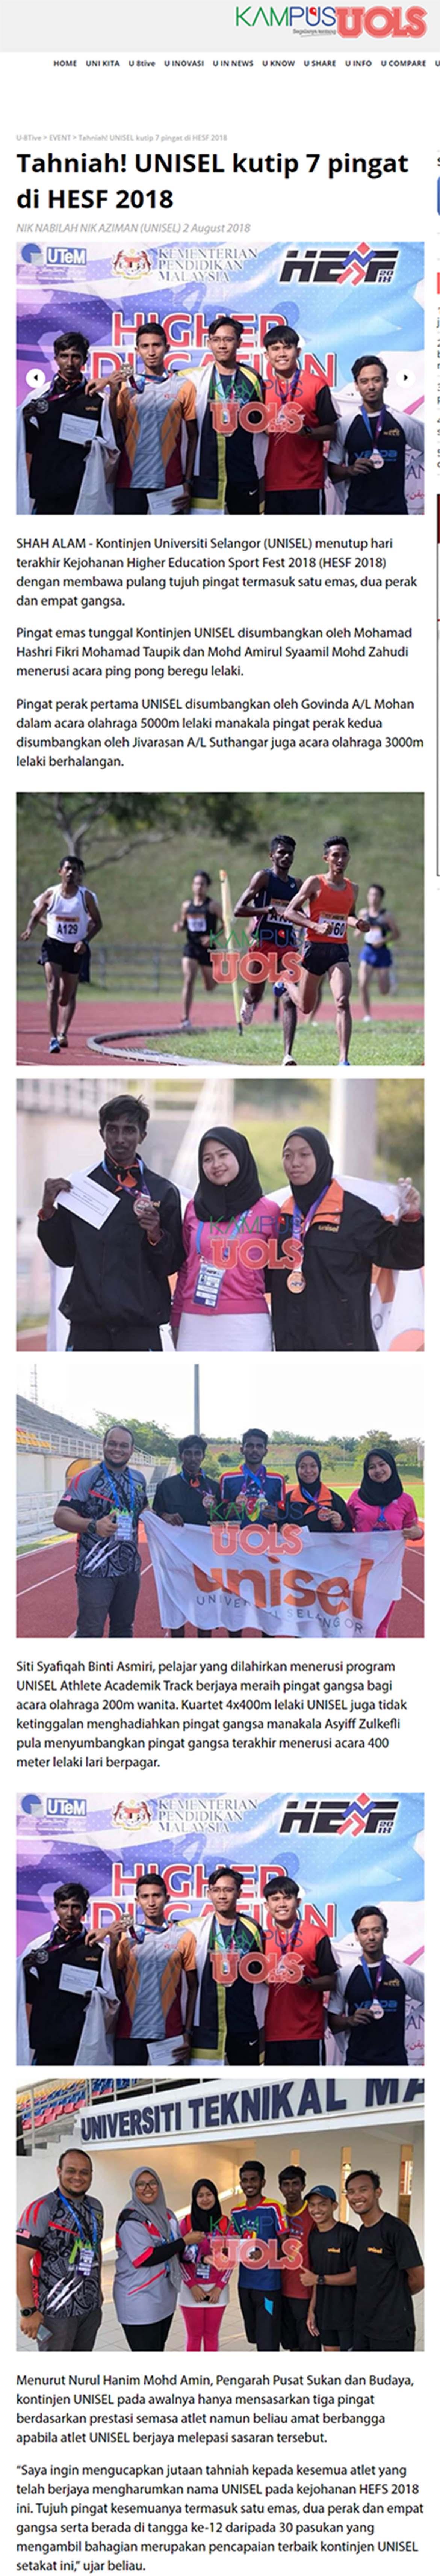 Kampusuols Sinar Harian Online - 2 Ogos 2018